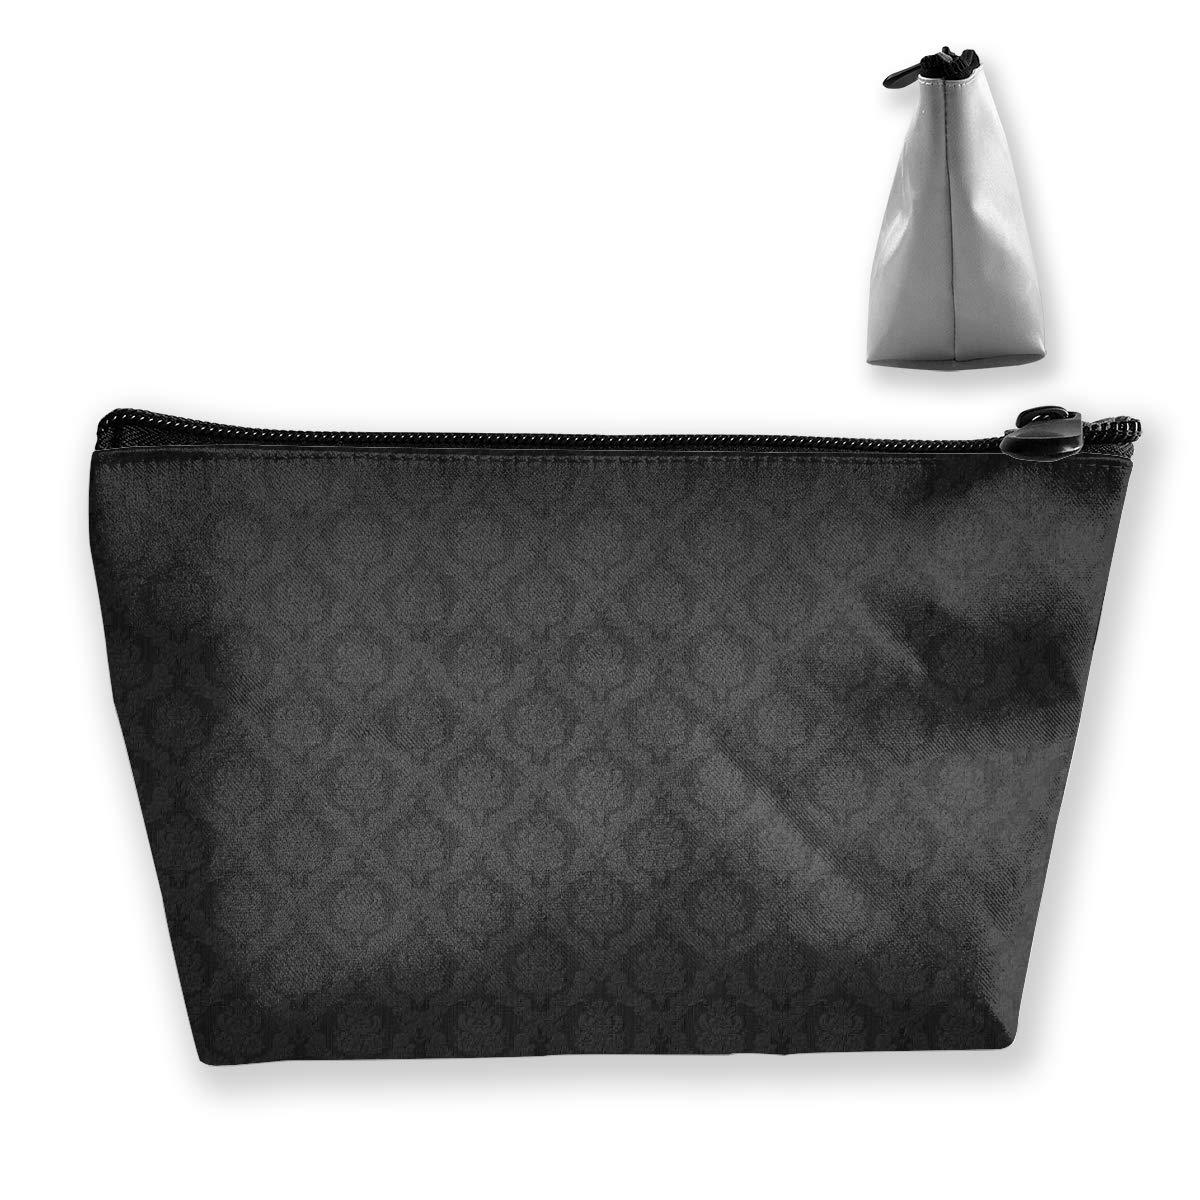 Lightweight Multi-Purpose Zipper Trapezoidal Storage Bag Organizer Pouch Small Cosmetic Makeup Bag Coin Cellphone Purse Pencil Pouch (Black Elegant Ornaments Texture)